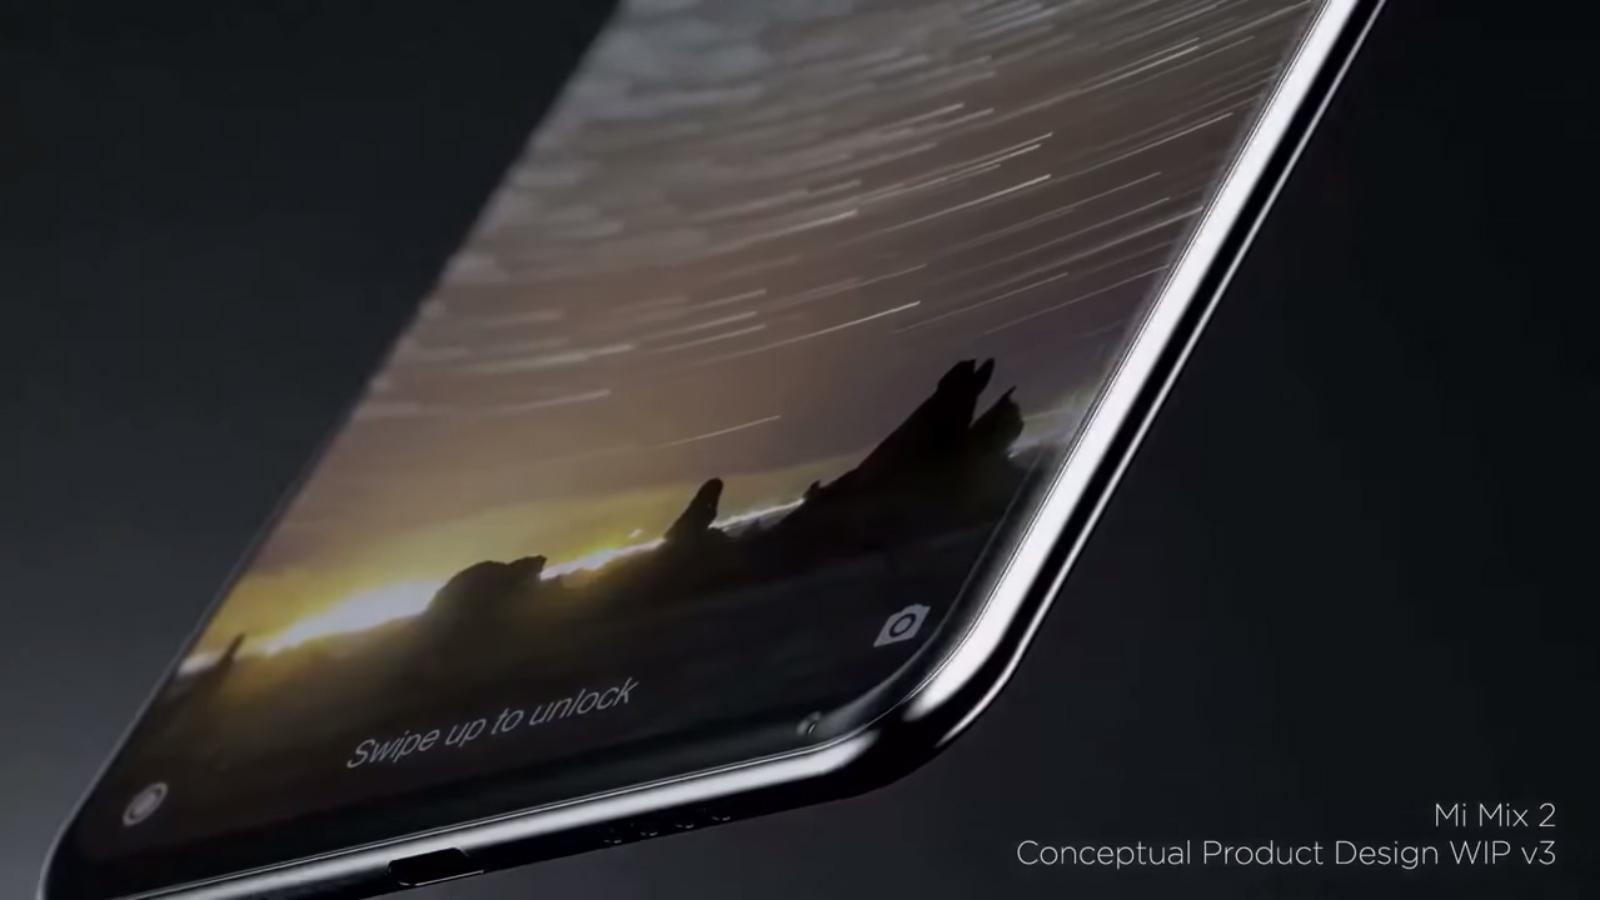 Xiaomi Mi MIX 2 diseño conceptual oficial por Philippe Starck